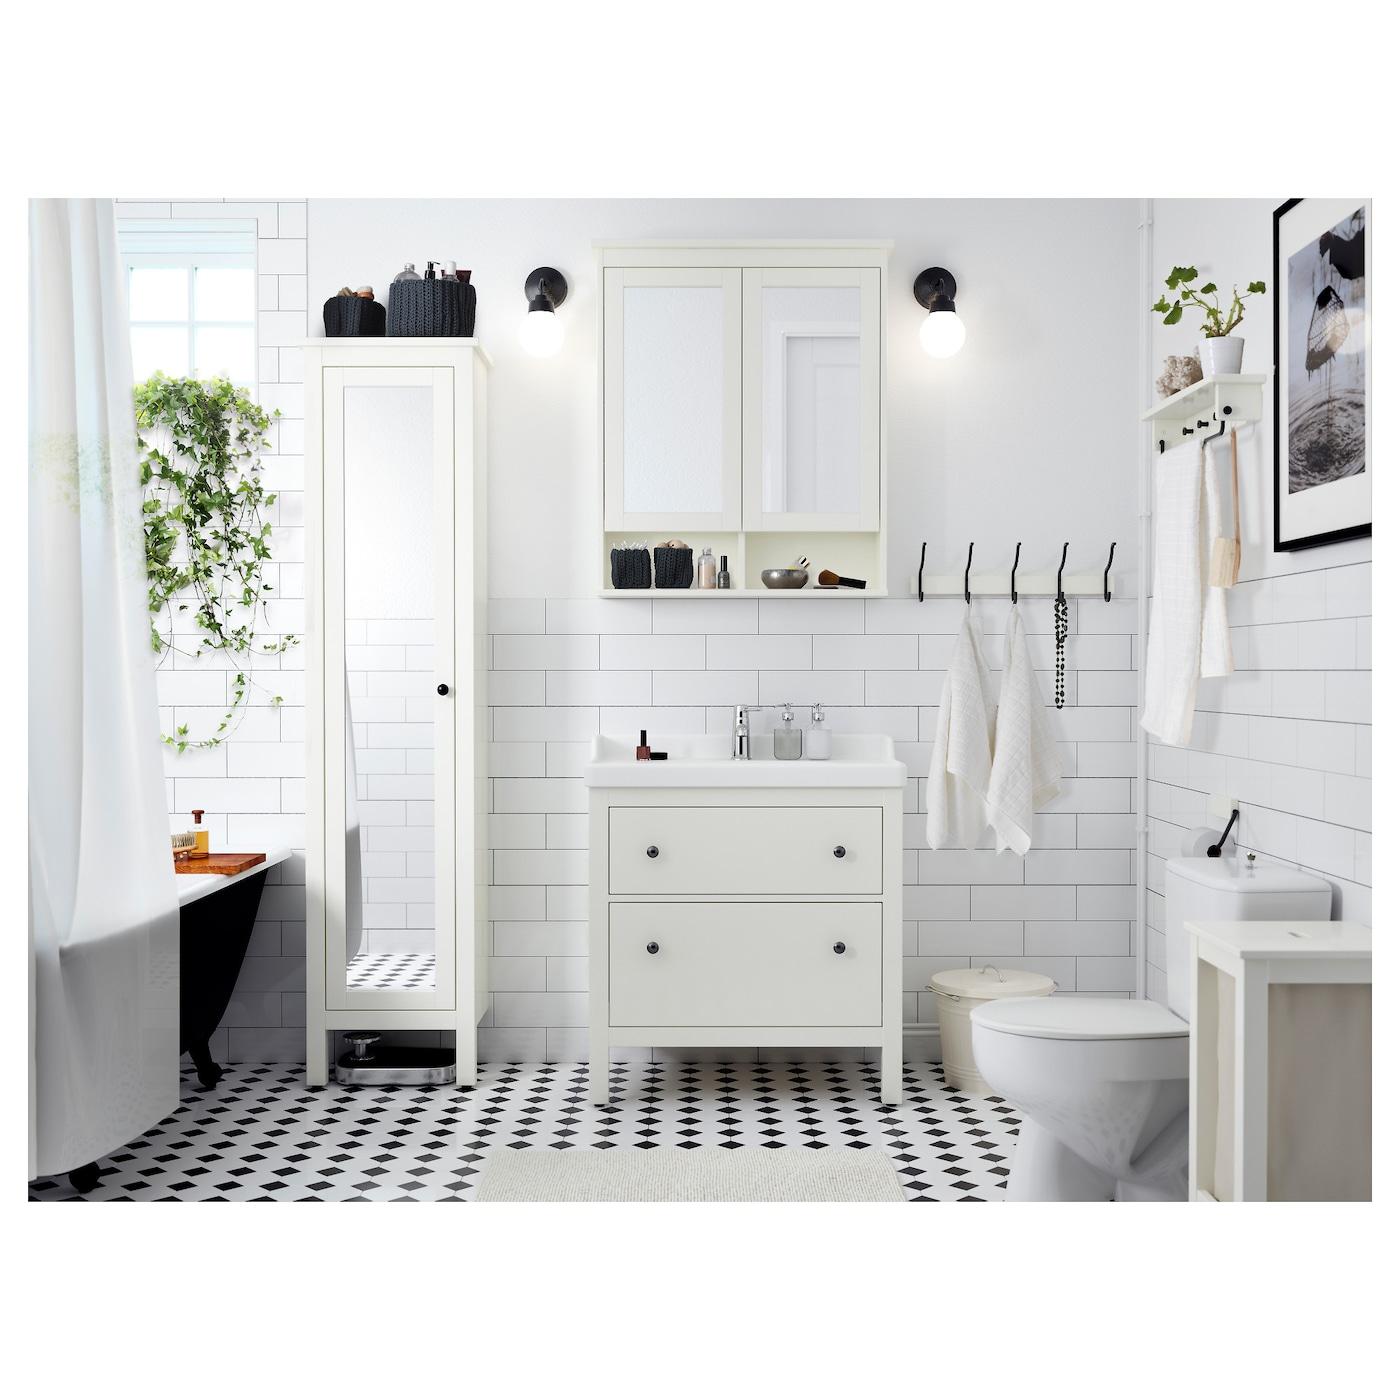 Hemnes r ttviken meuble lavabo 2tir blanc 80x49x89 cm ikea for Meubles lavabo ikea